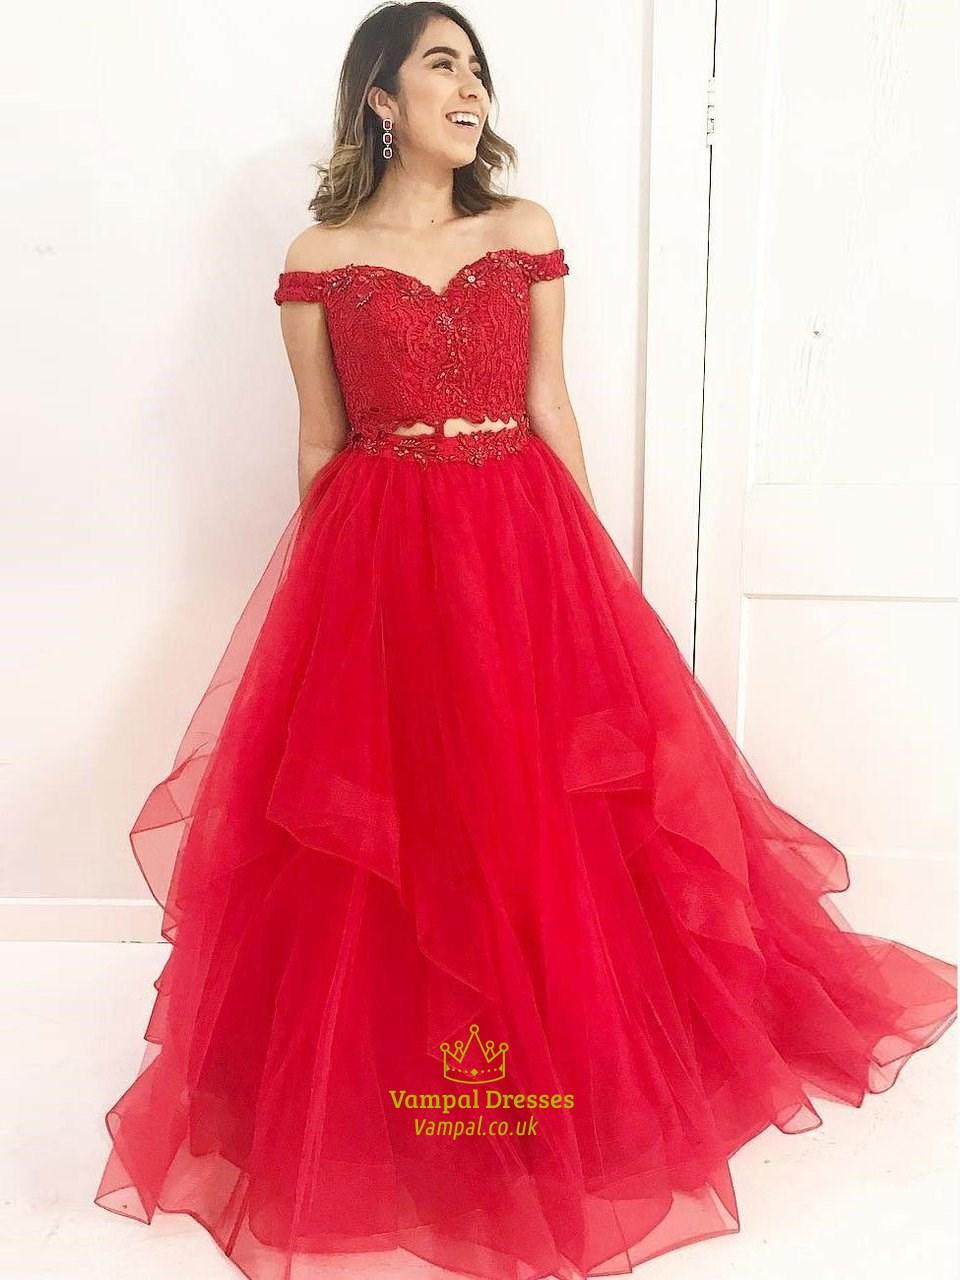 Next Asymmetric Hem Royal Blue Top and Chiffon Dress nairobi eddie